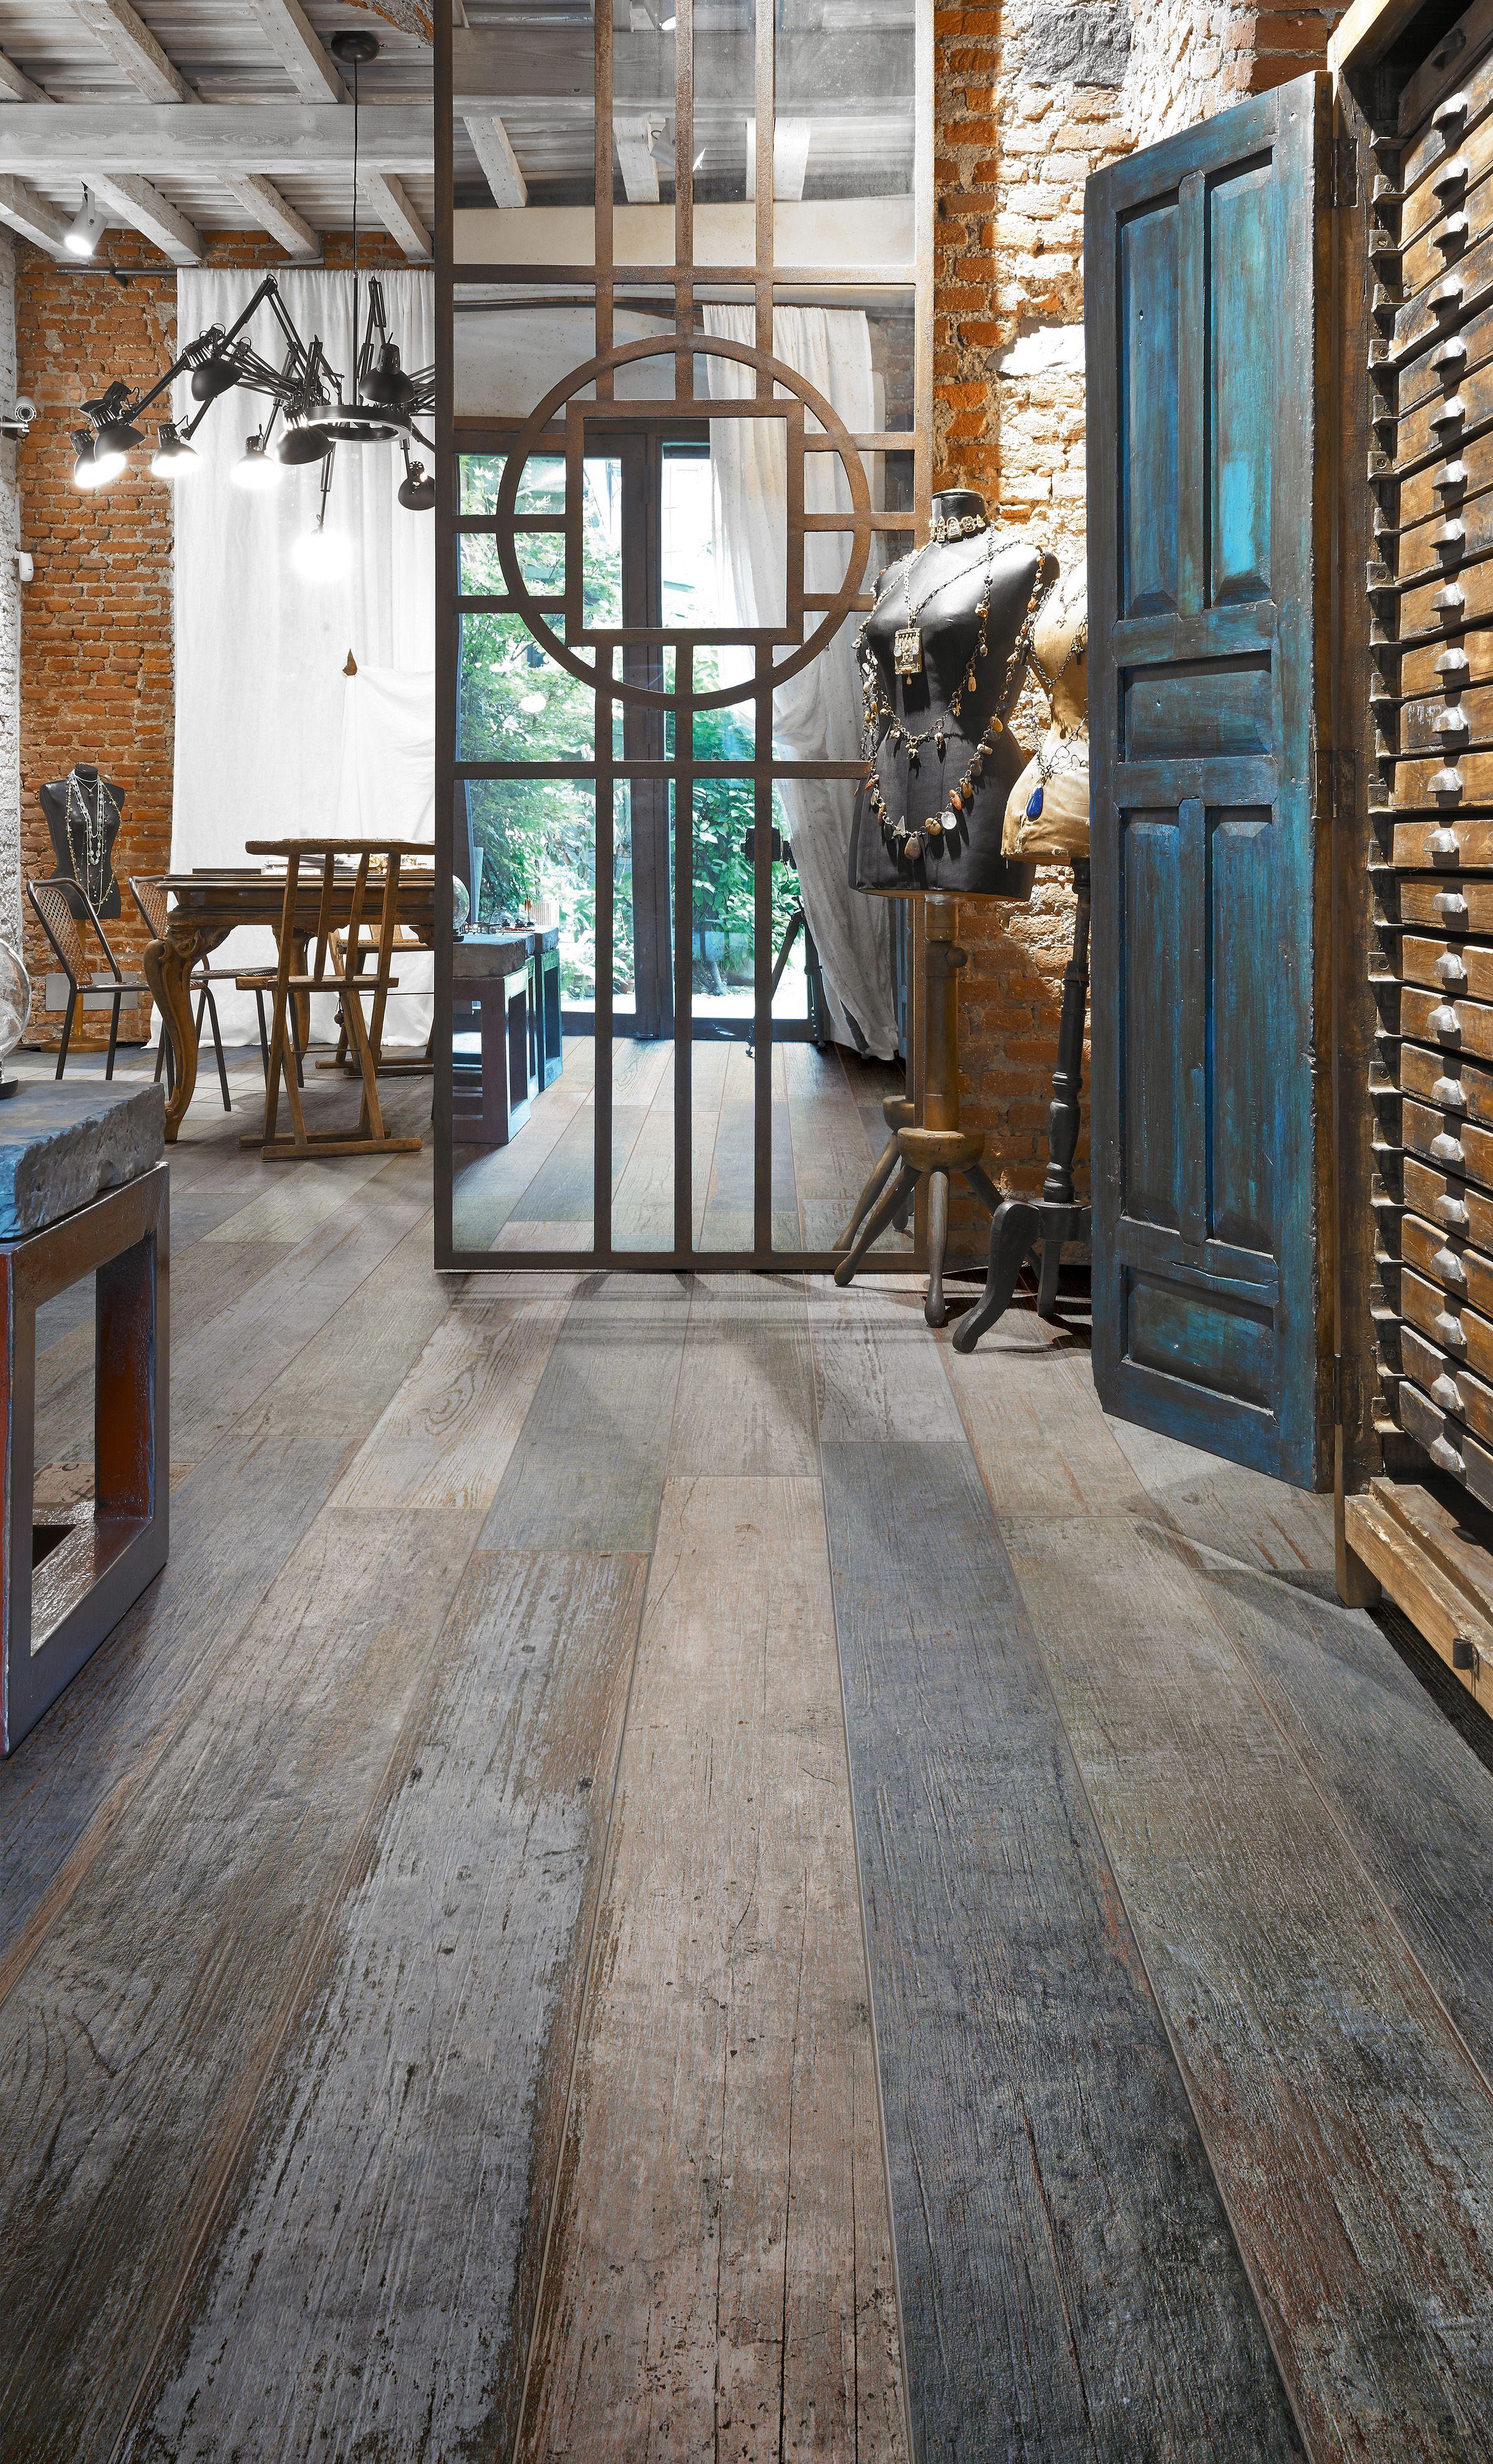 BLENDART by Ceramica Sant Agostino recreates the charming veining of